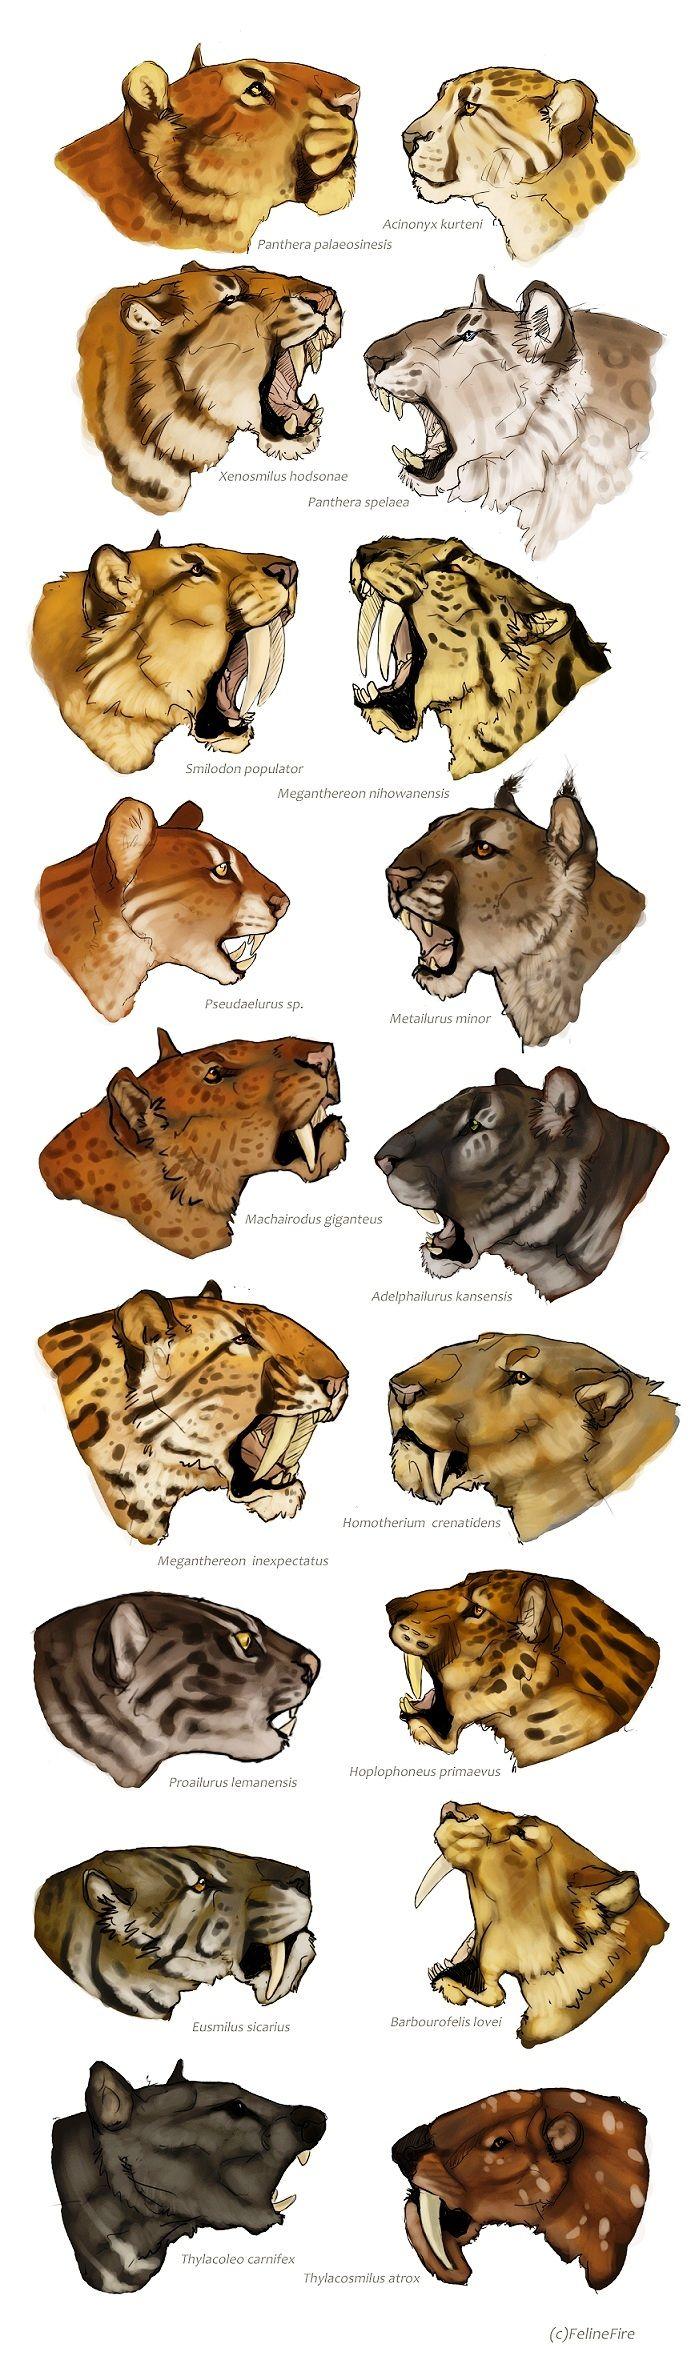 Feline ancestors